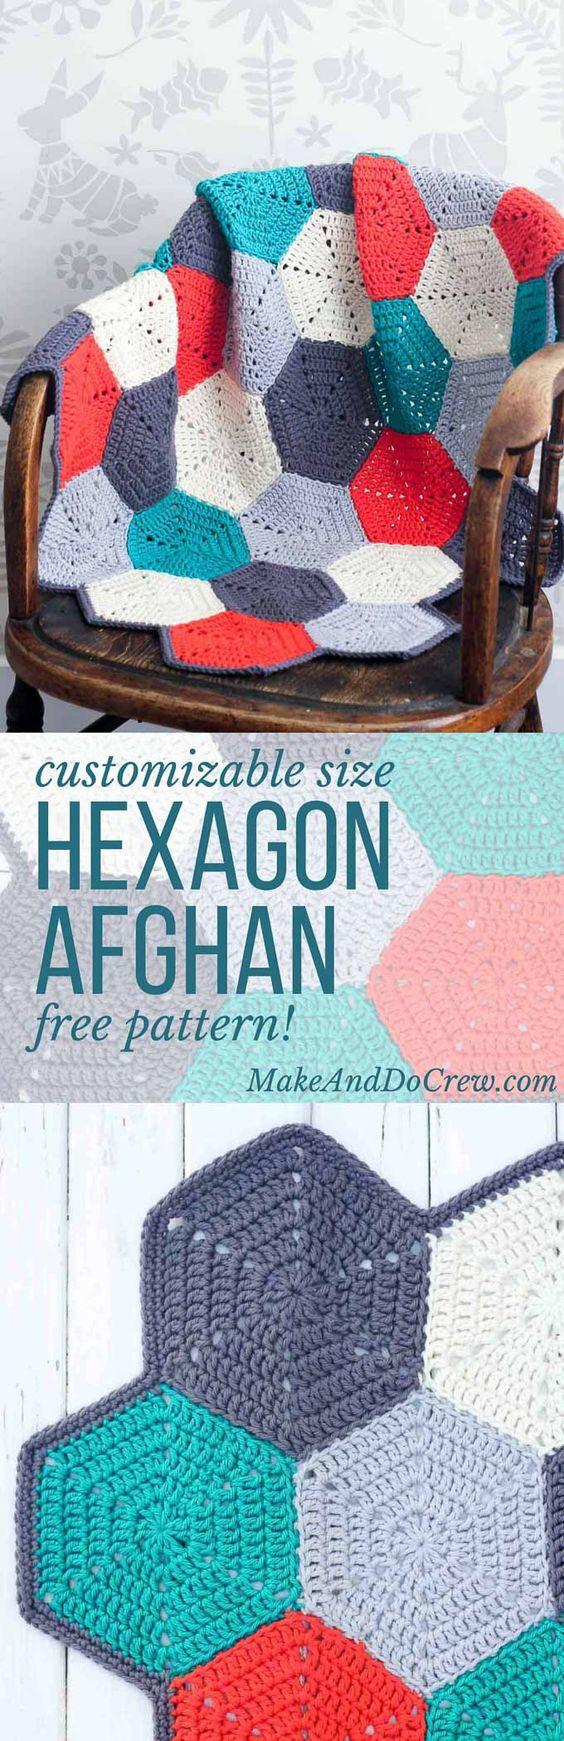 Happy Hexagons Free Crochet Afghan Pattern.